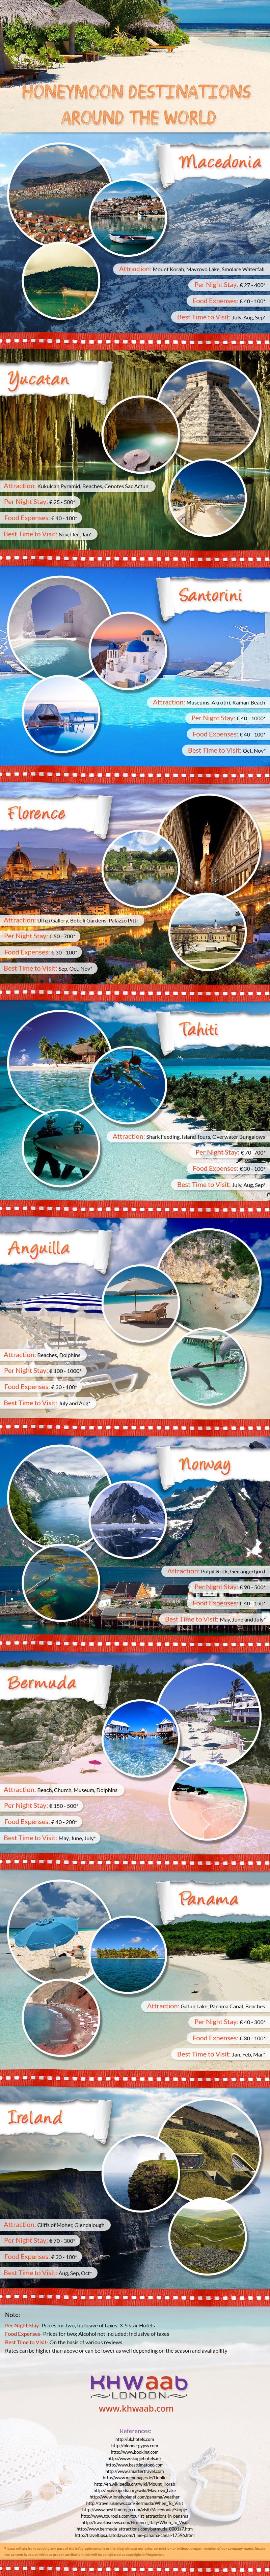 Infographic: Honeymoon Destinations Around The World